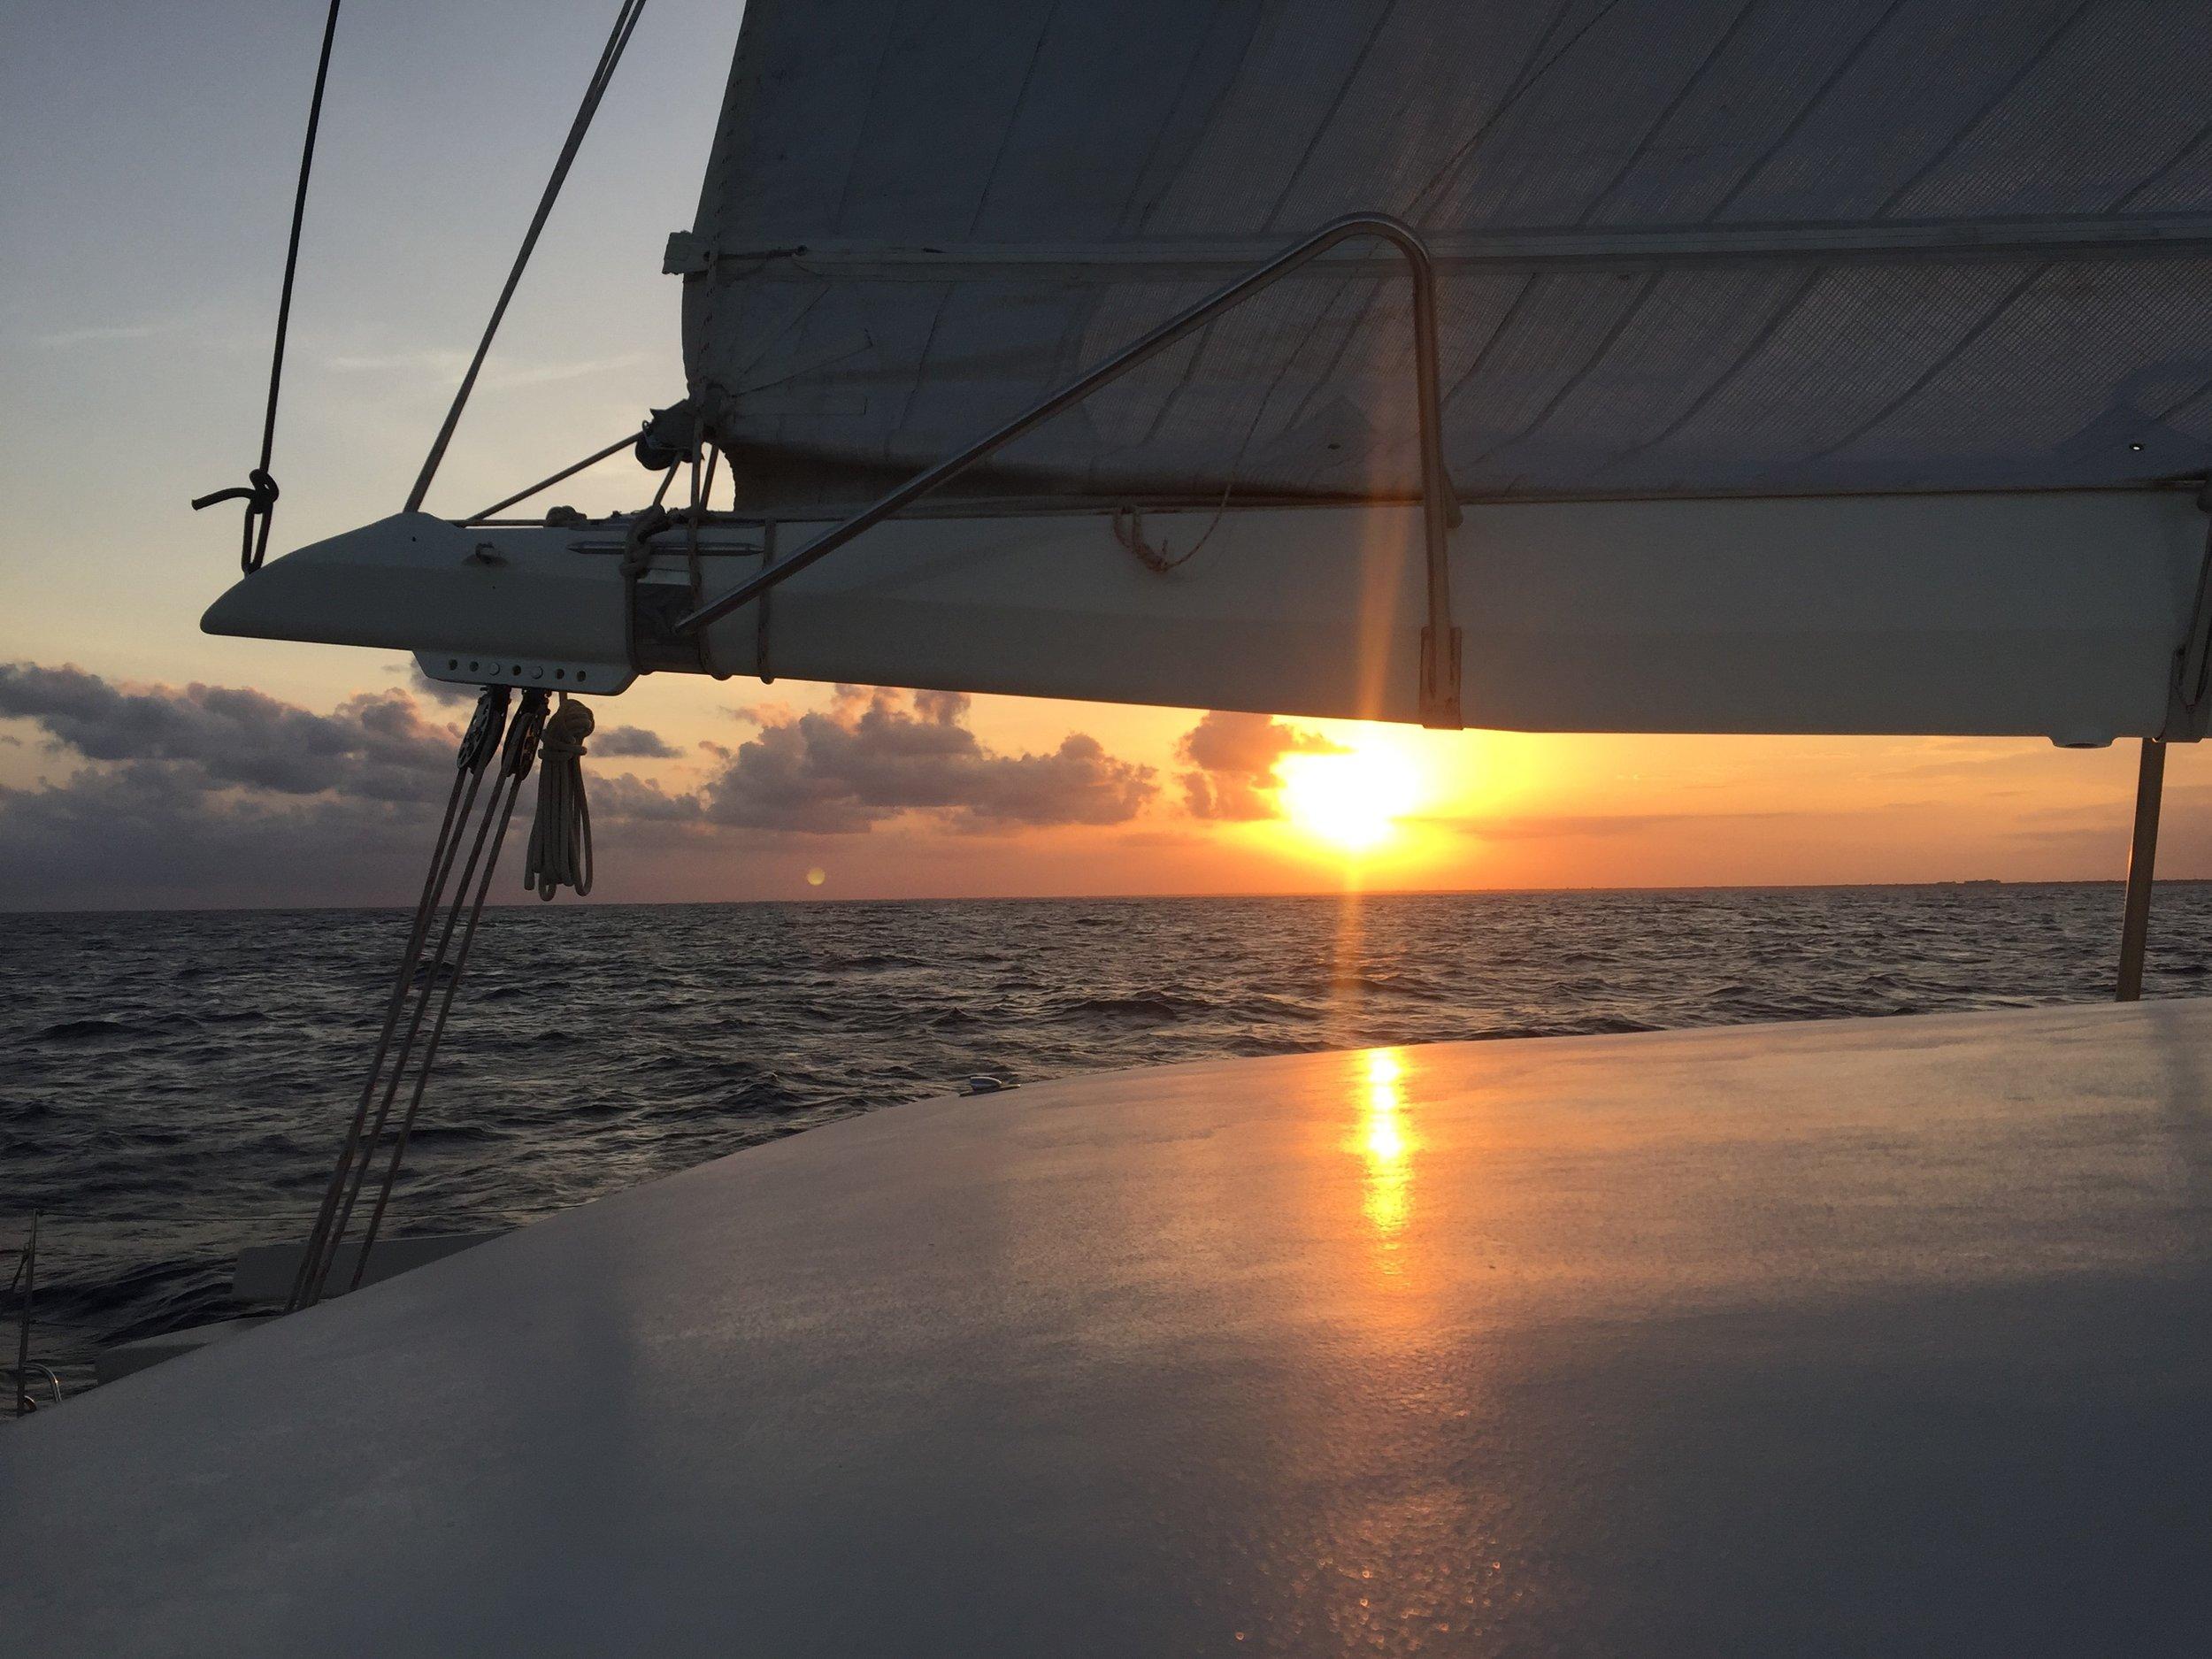 sunsetsail.jpg